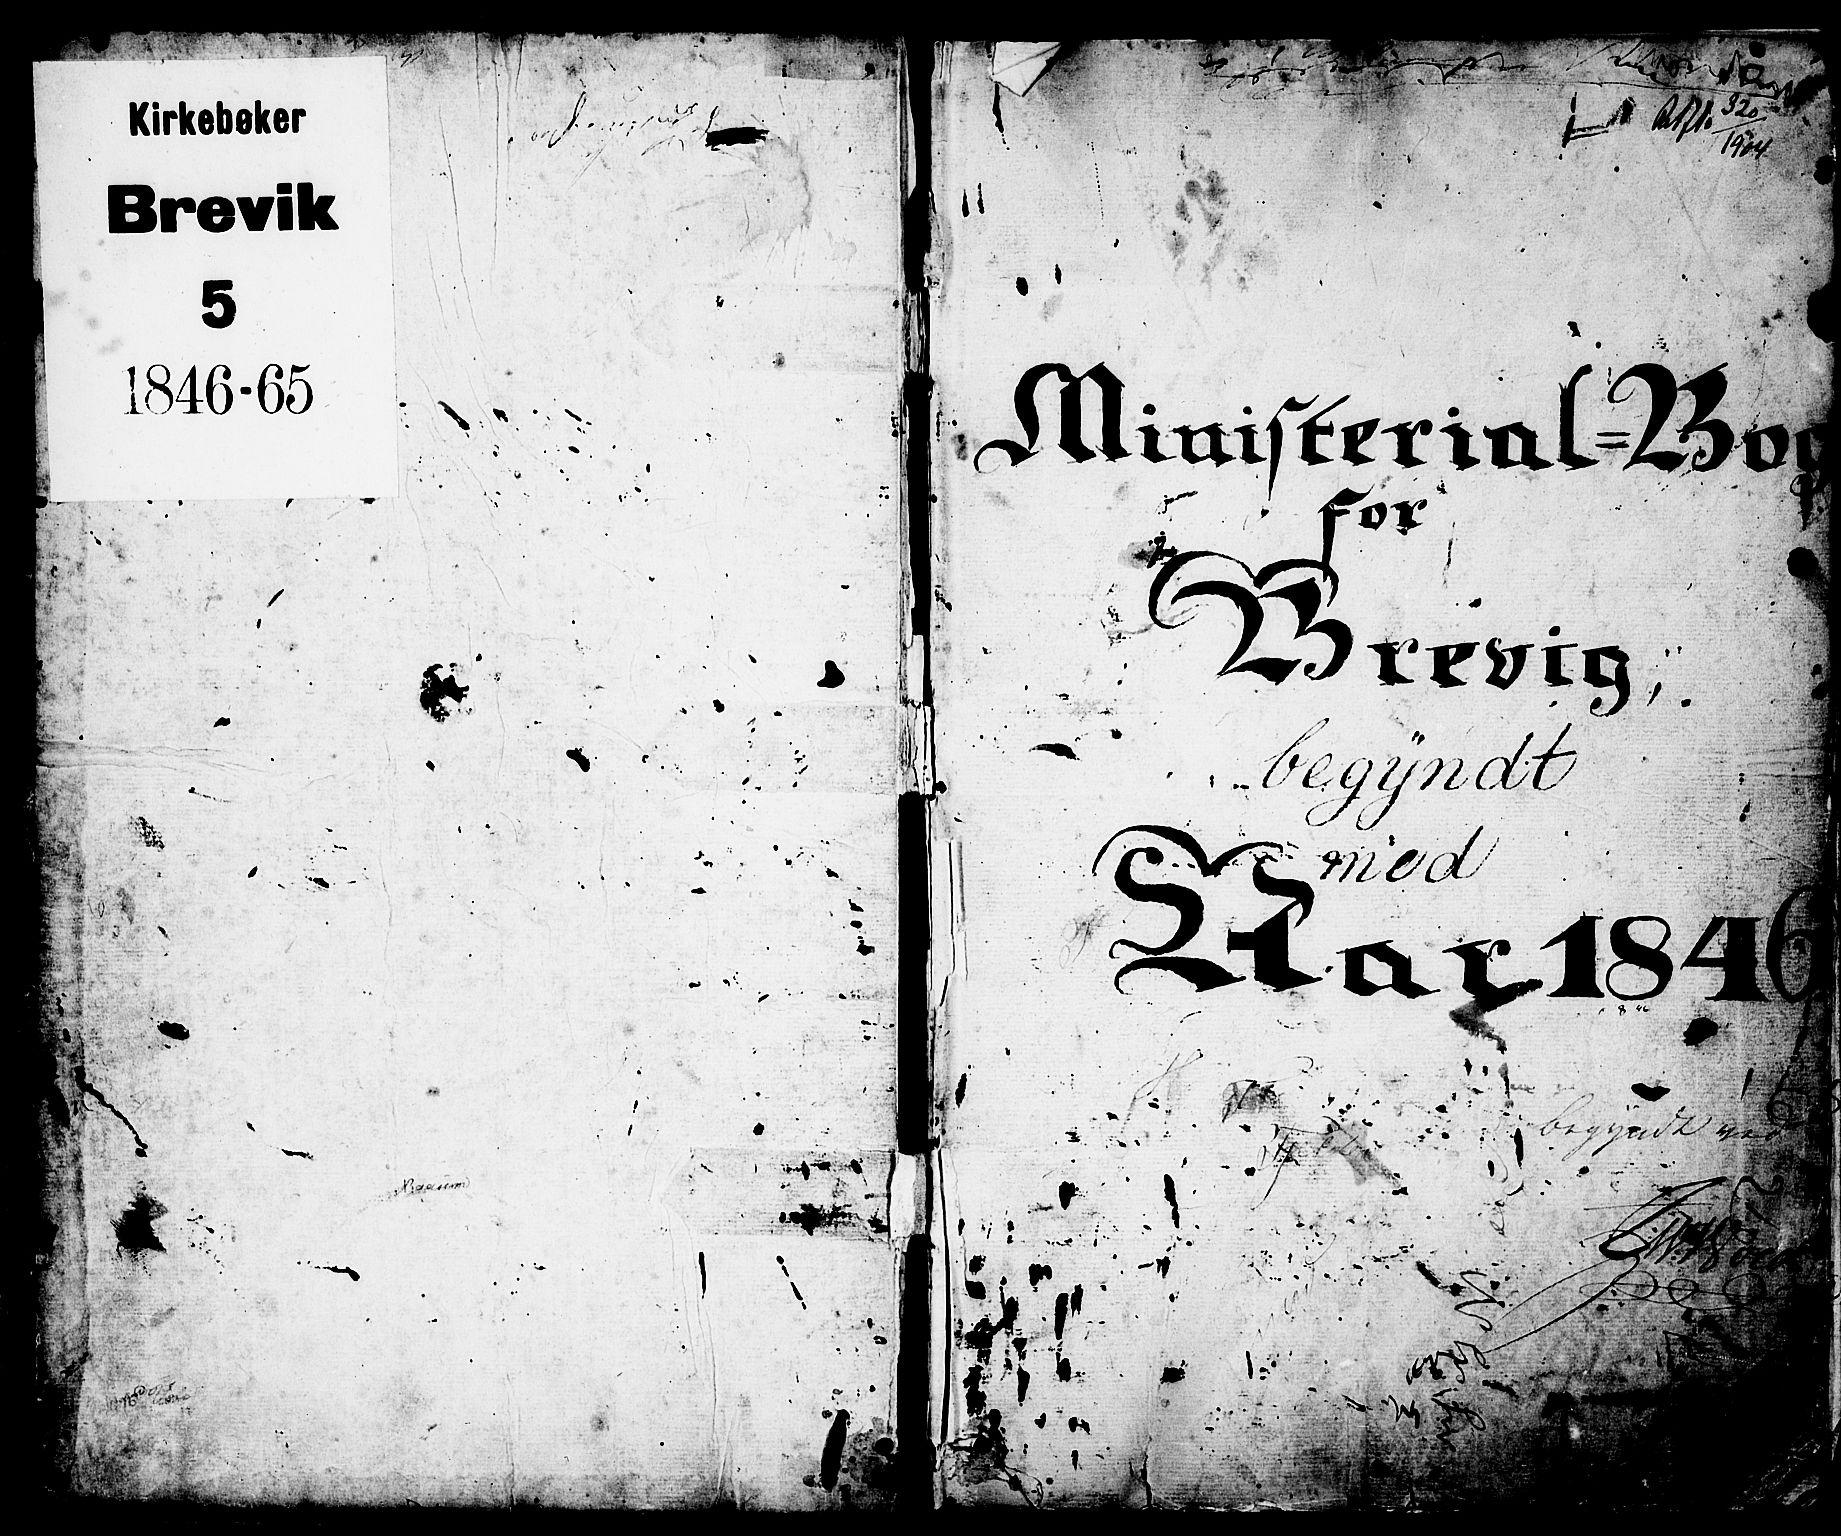 SAKO, Brevik kirkebøker, G/Ga/L0002: Klokkerbok nr. 2, 1846-1865, s. 1